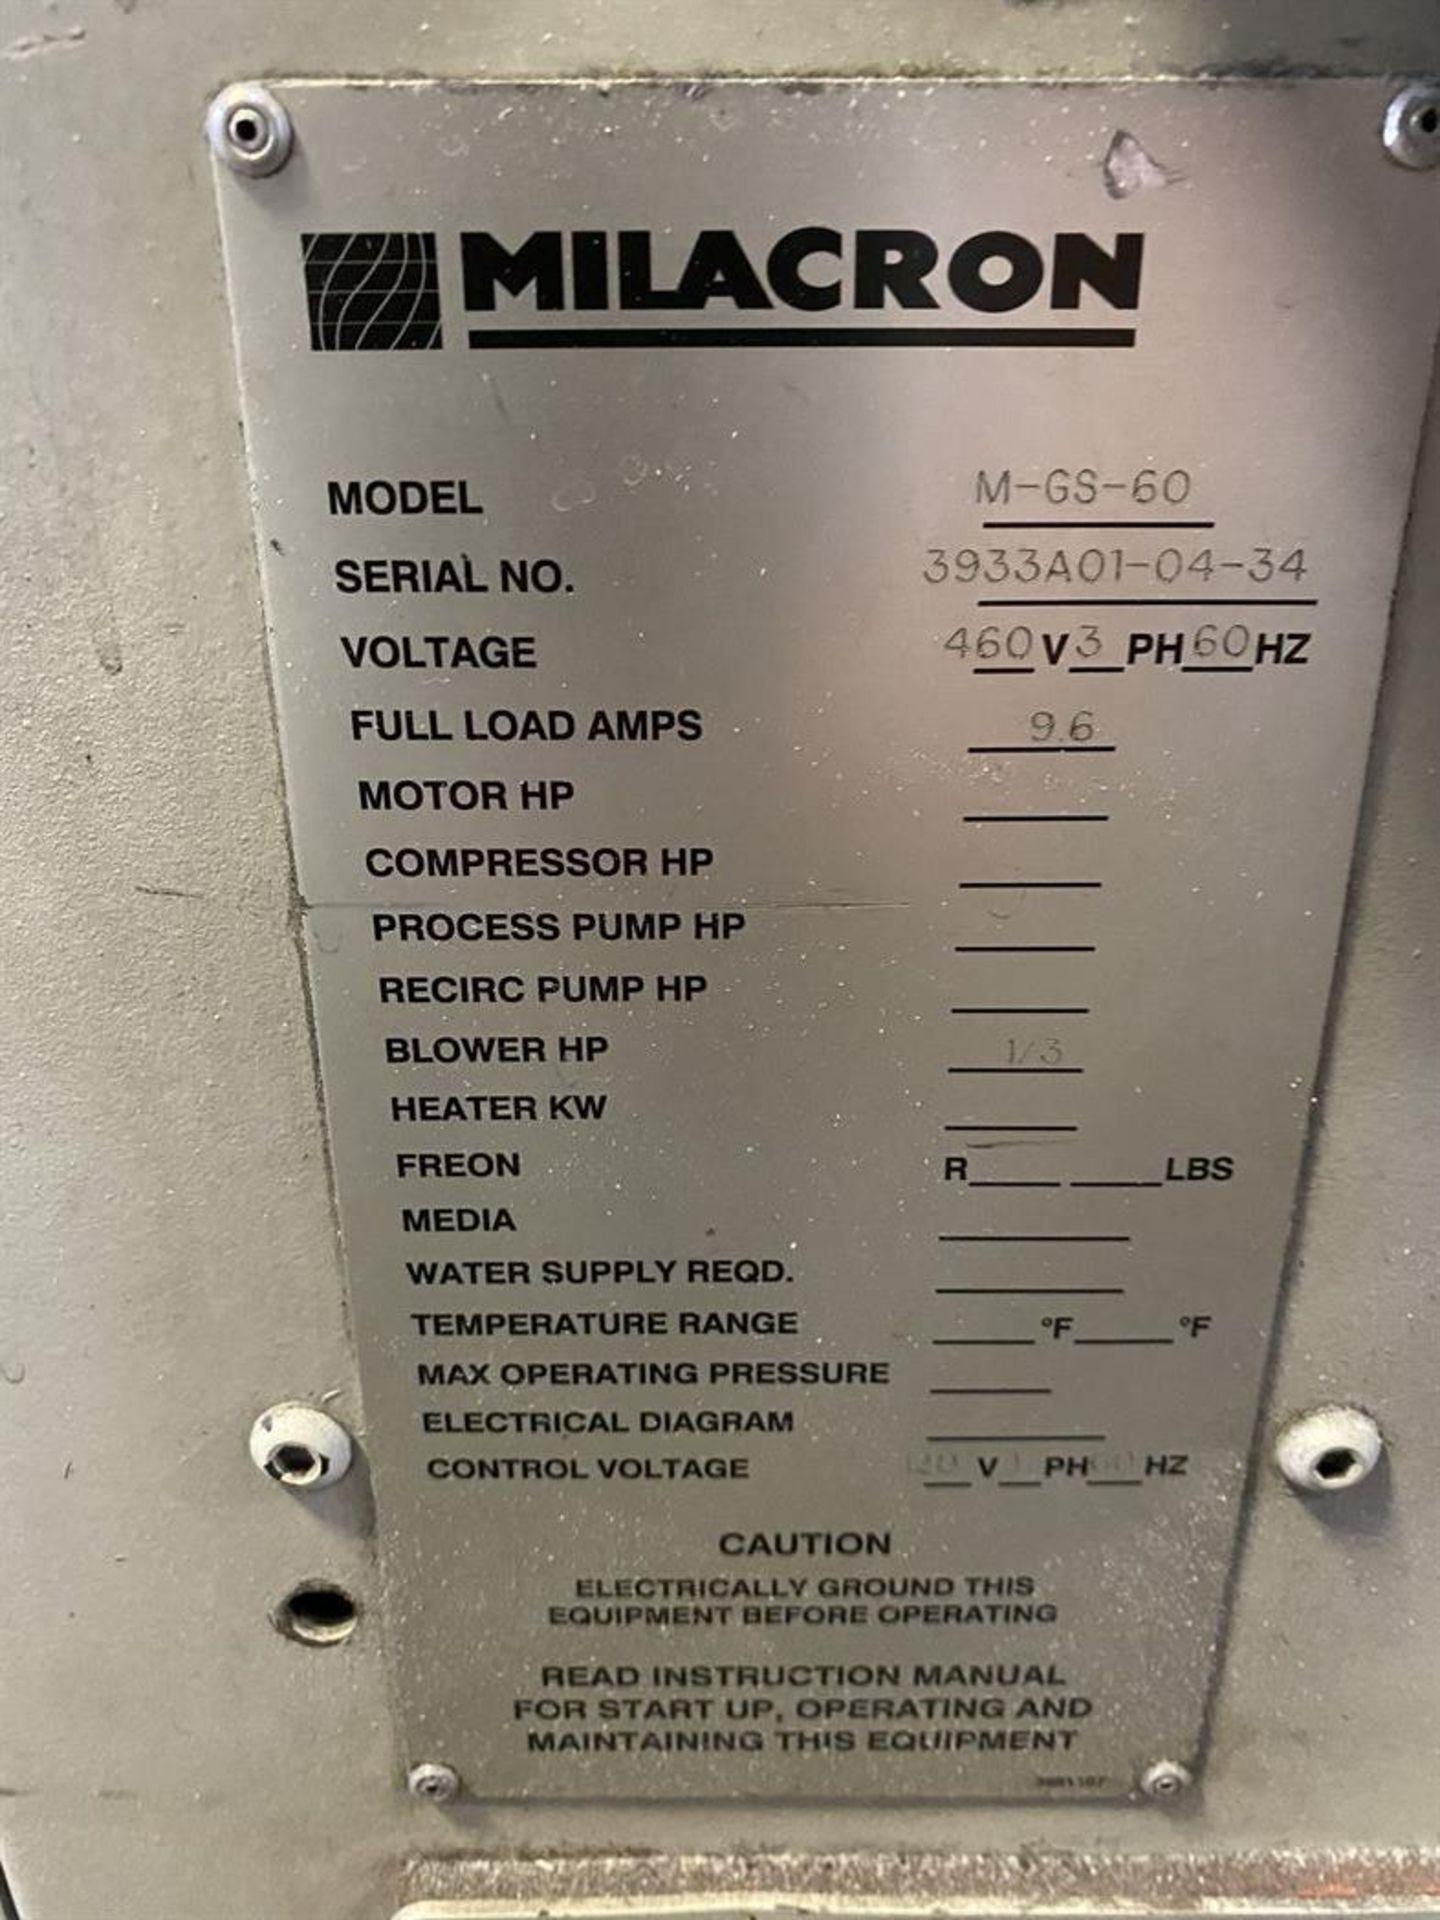 Lot 218 - Cincinnati Milacron M-GS-60 Hopper Dryer System, s/n 3933A01-04-34, w/ Vacuum Loader